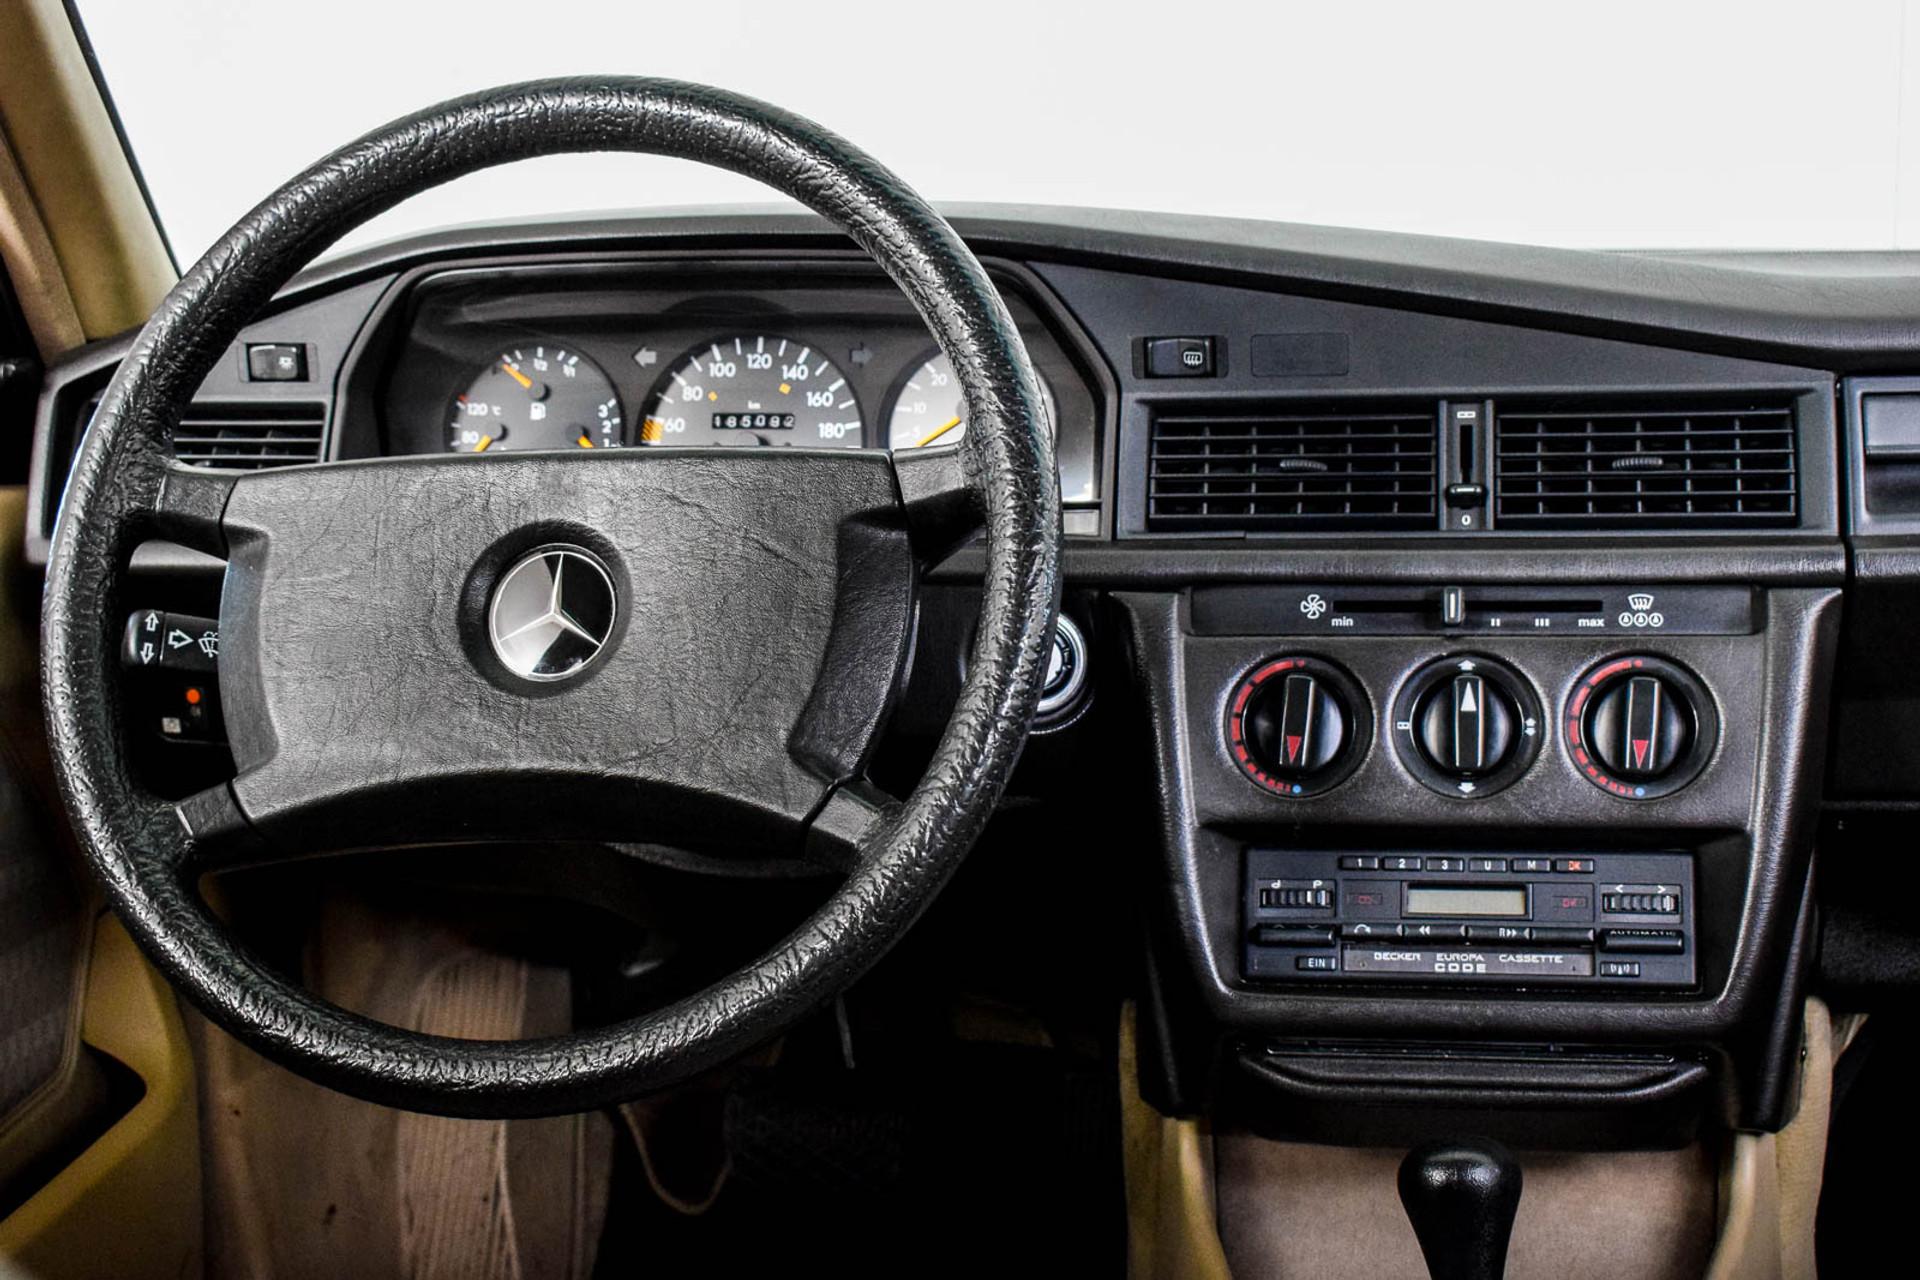 Mercedes-Benz 190 2.5 D Turbo Diesel Foto 51